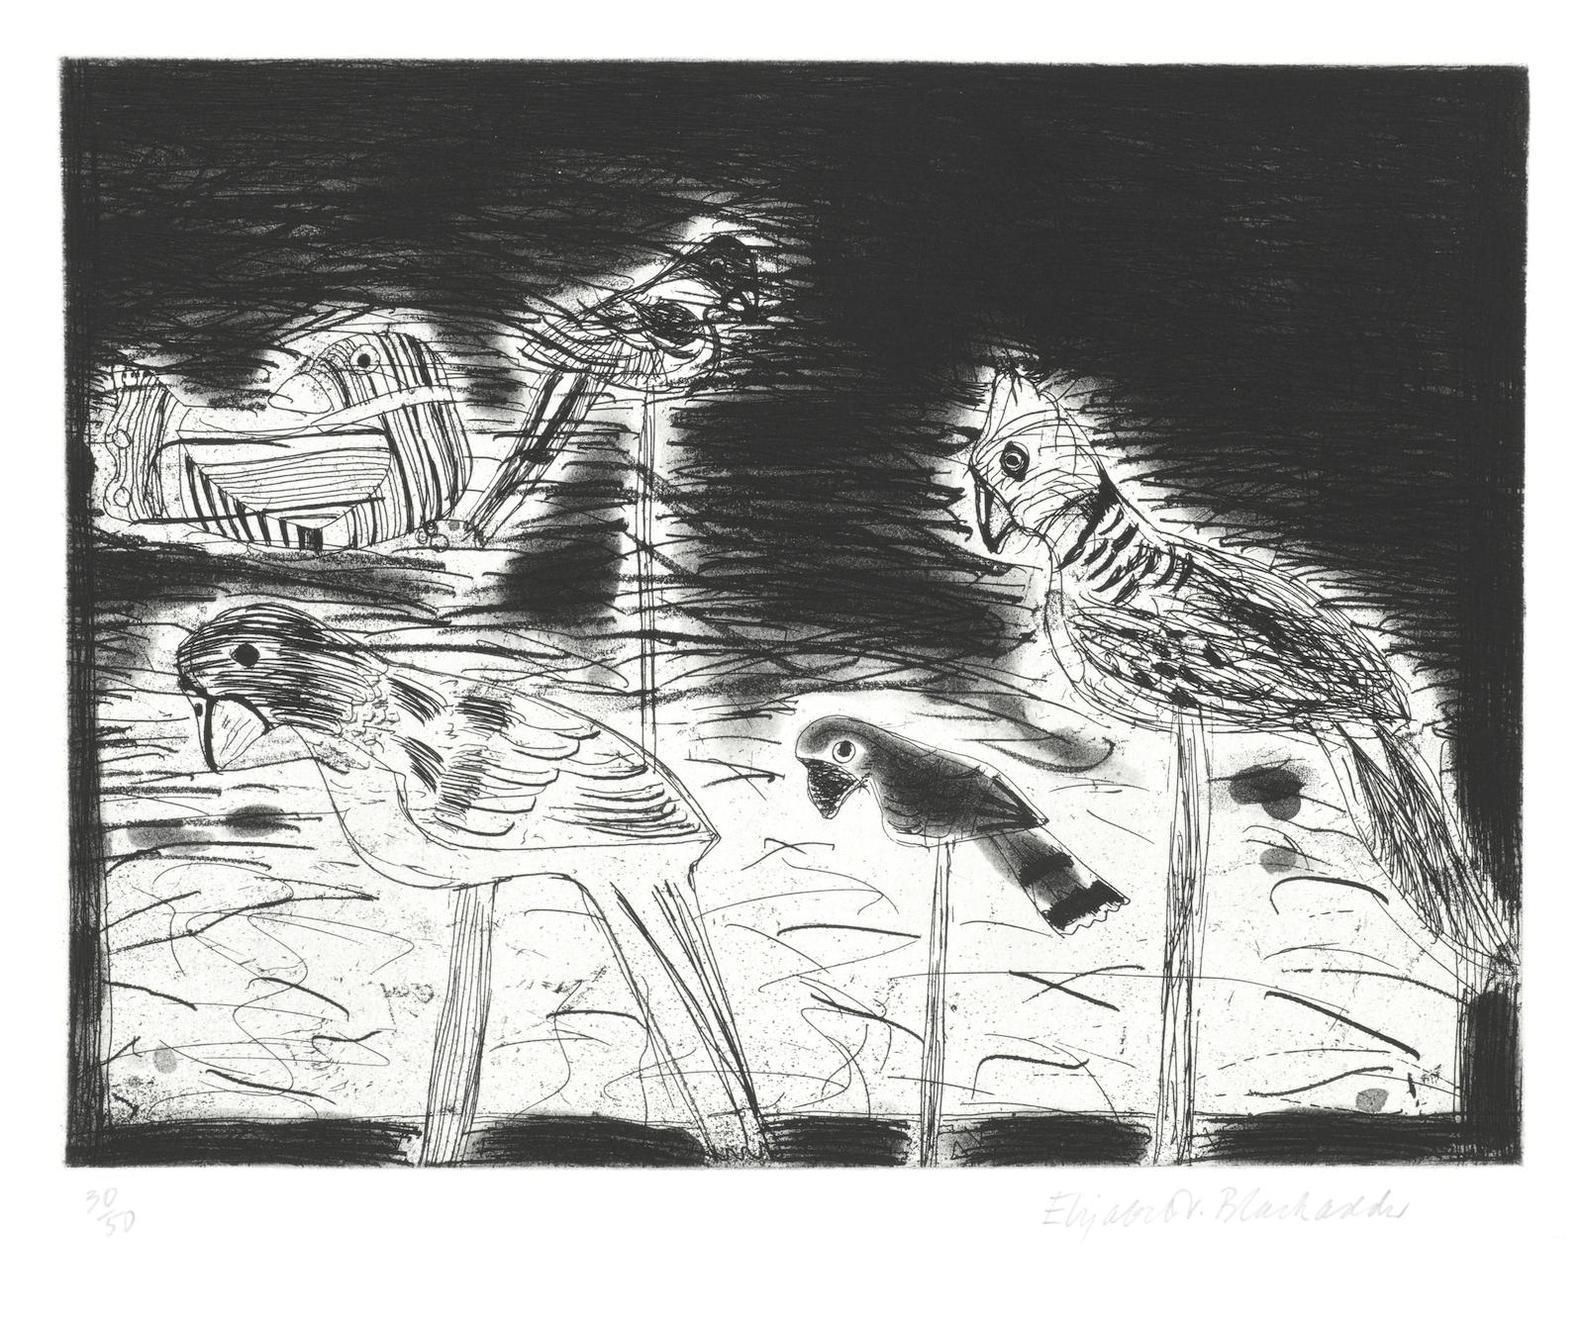 Dame Elizabeth Blackadder Obe Ra - Parrots-1987